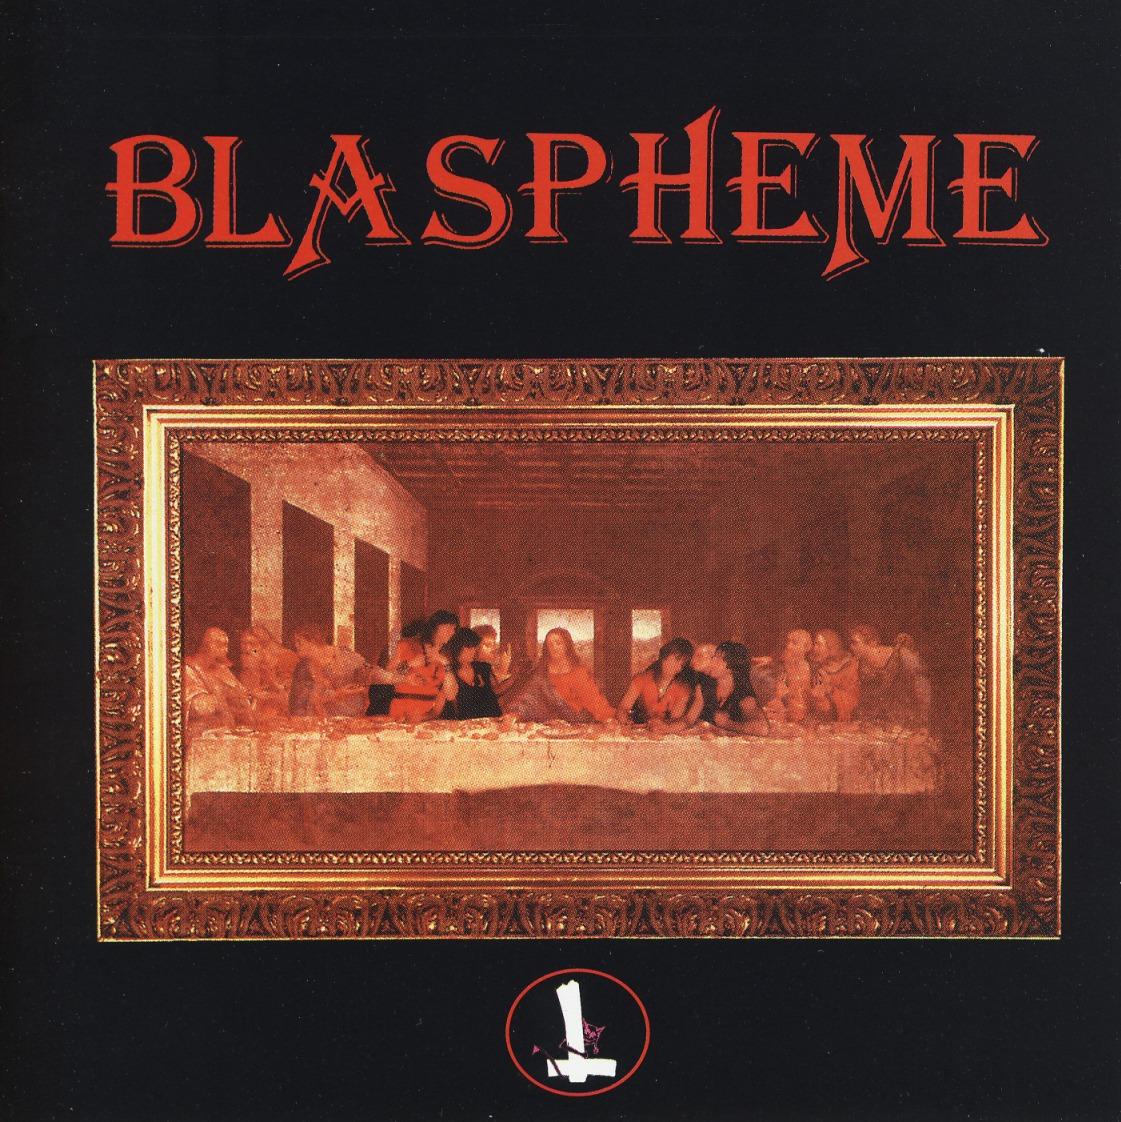 BLASPHEME (France) / Blaspheme